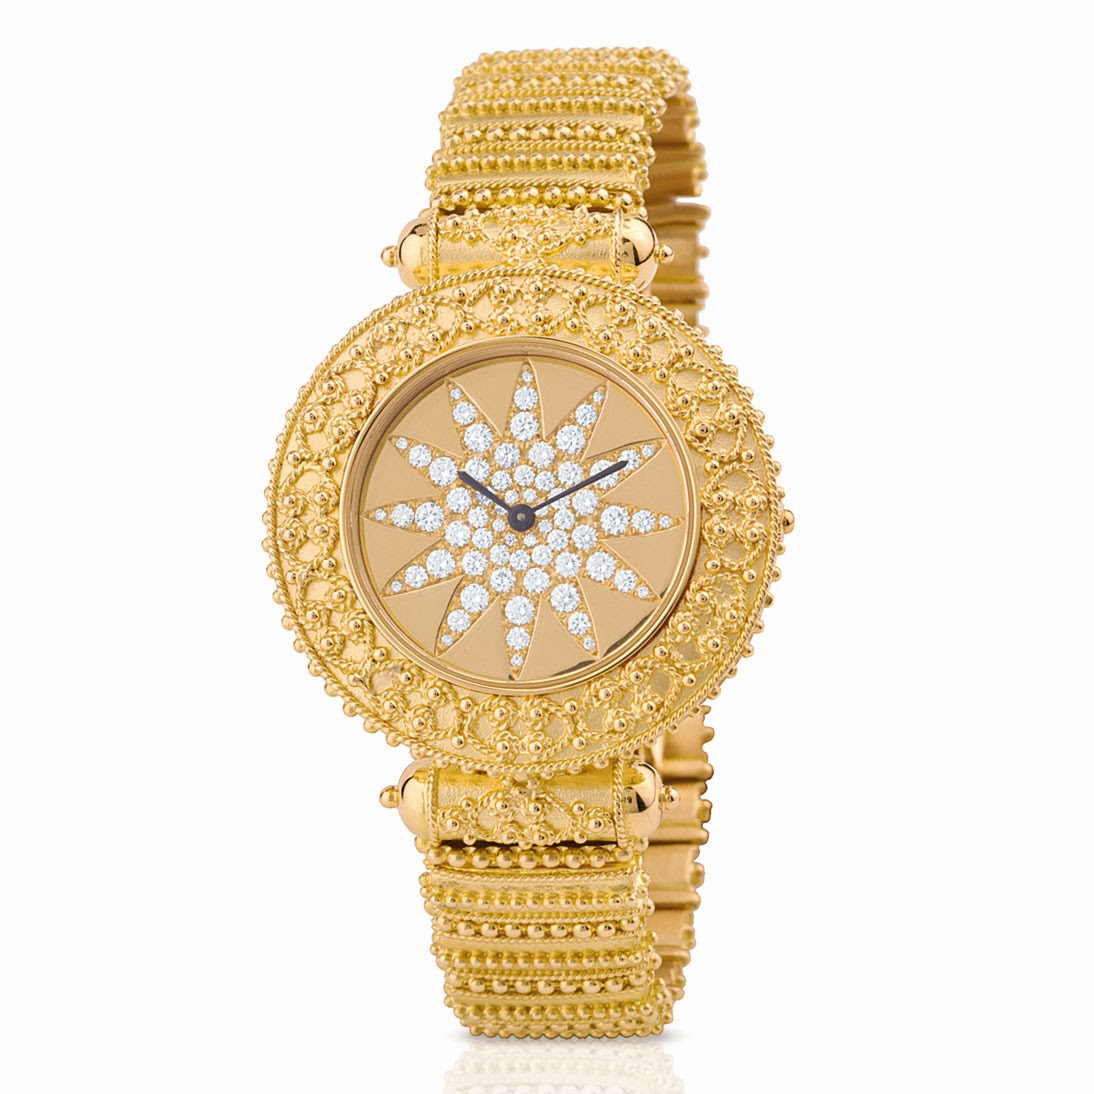 Matthia's & Claire Etrusca Watch